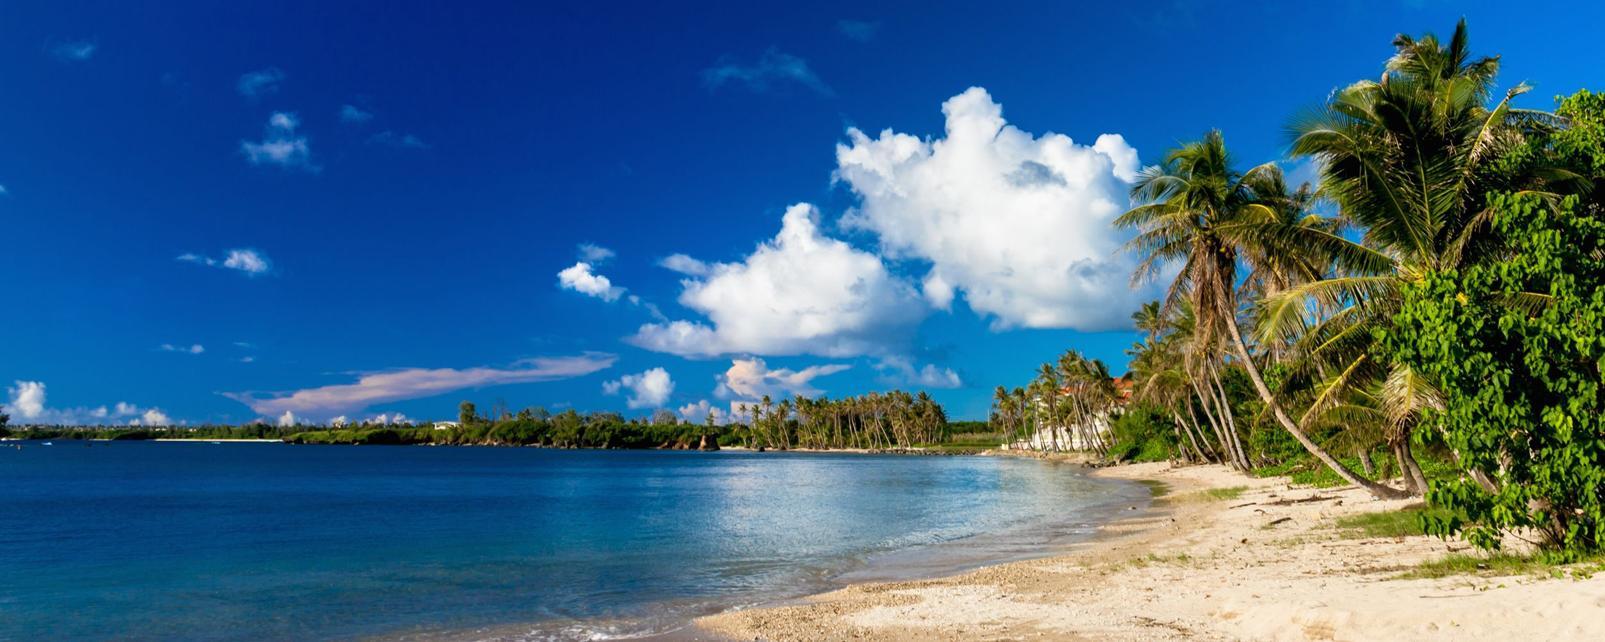 Agana, Guam